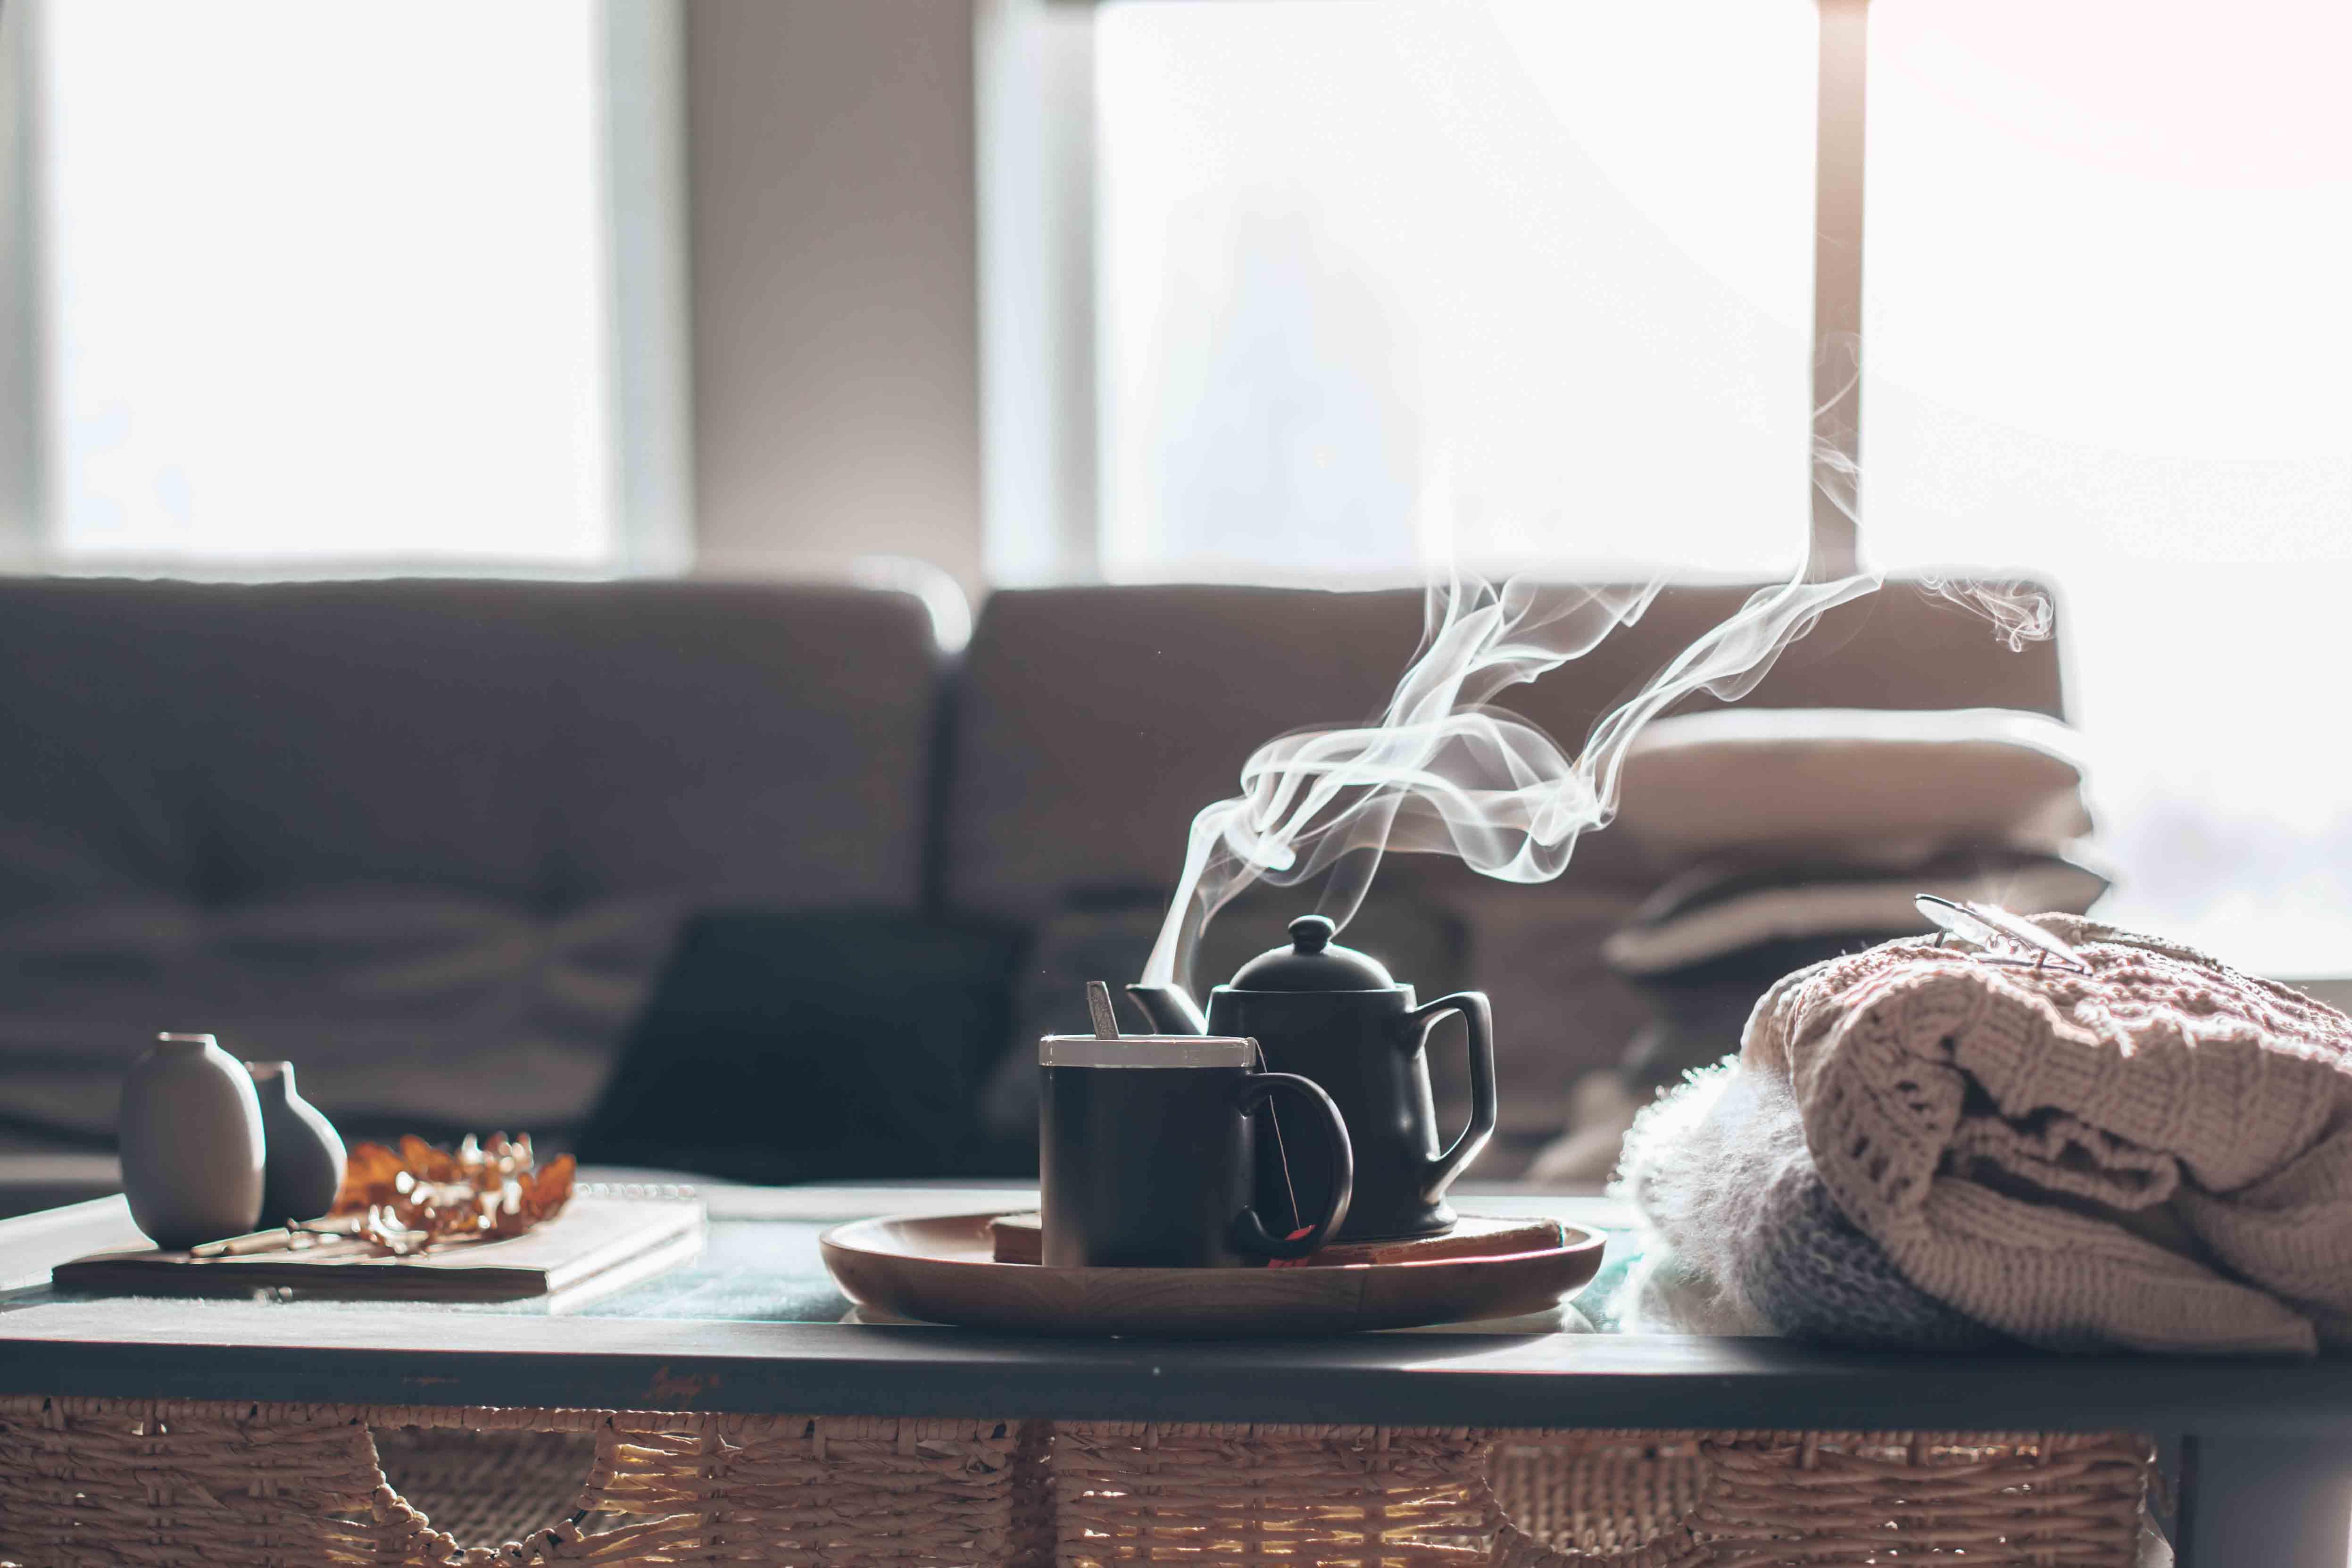 Home interior living, coffee, cosy